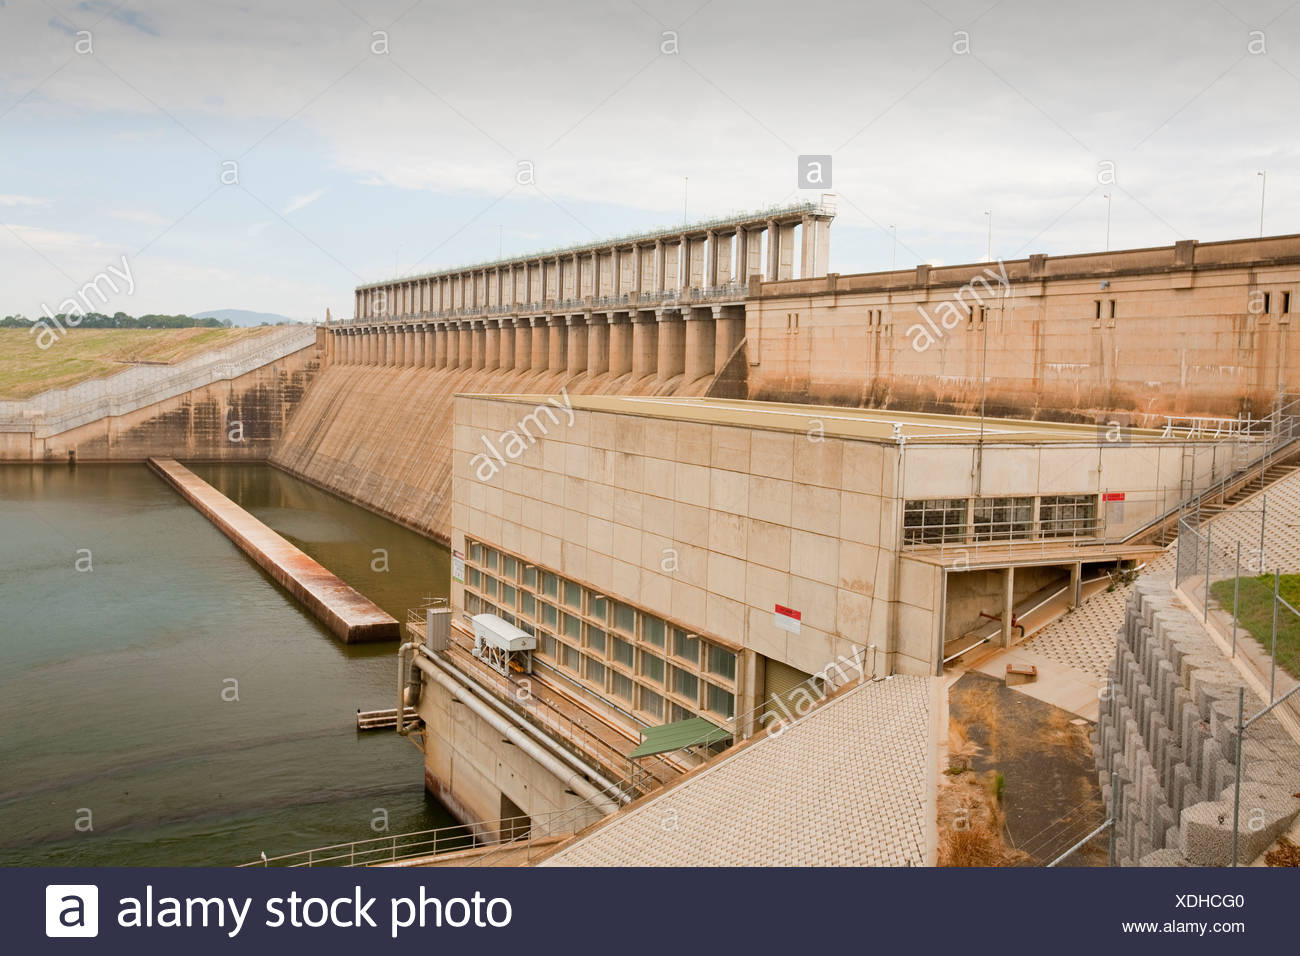 Hume Dam Stock Photos & Hume Dam Stock Images - Alamy